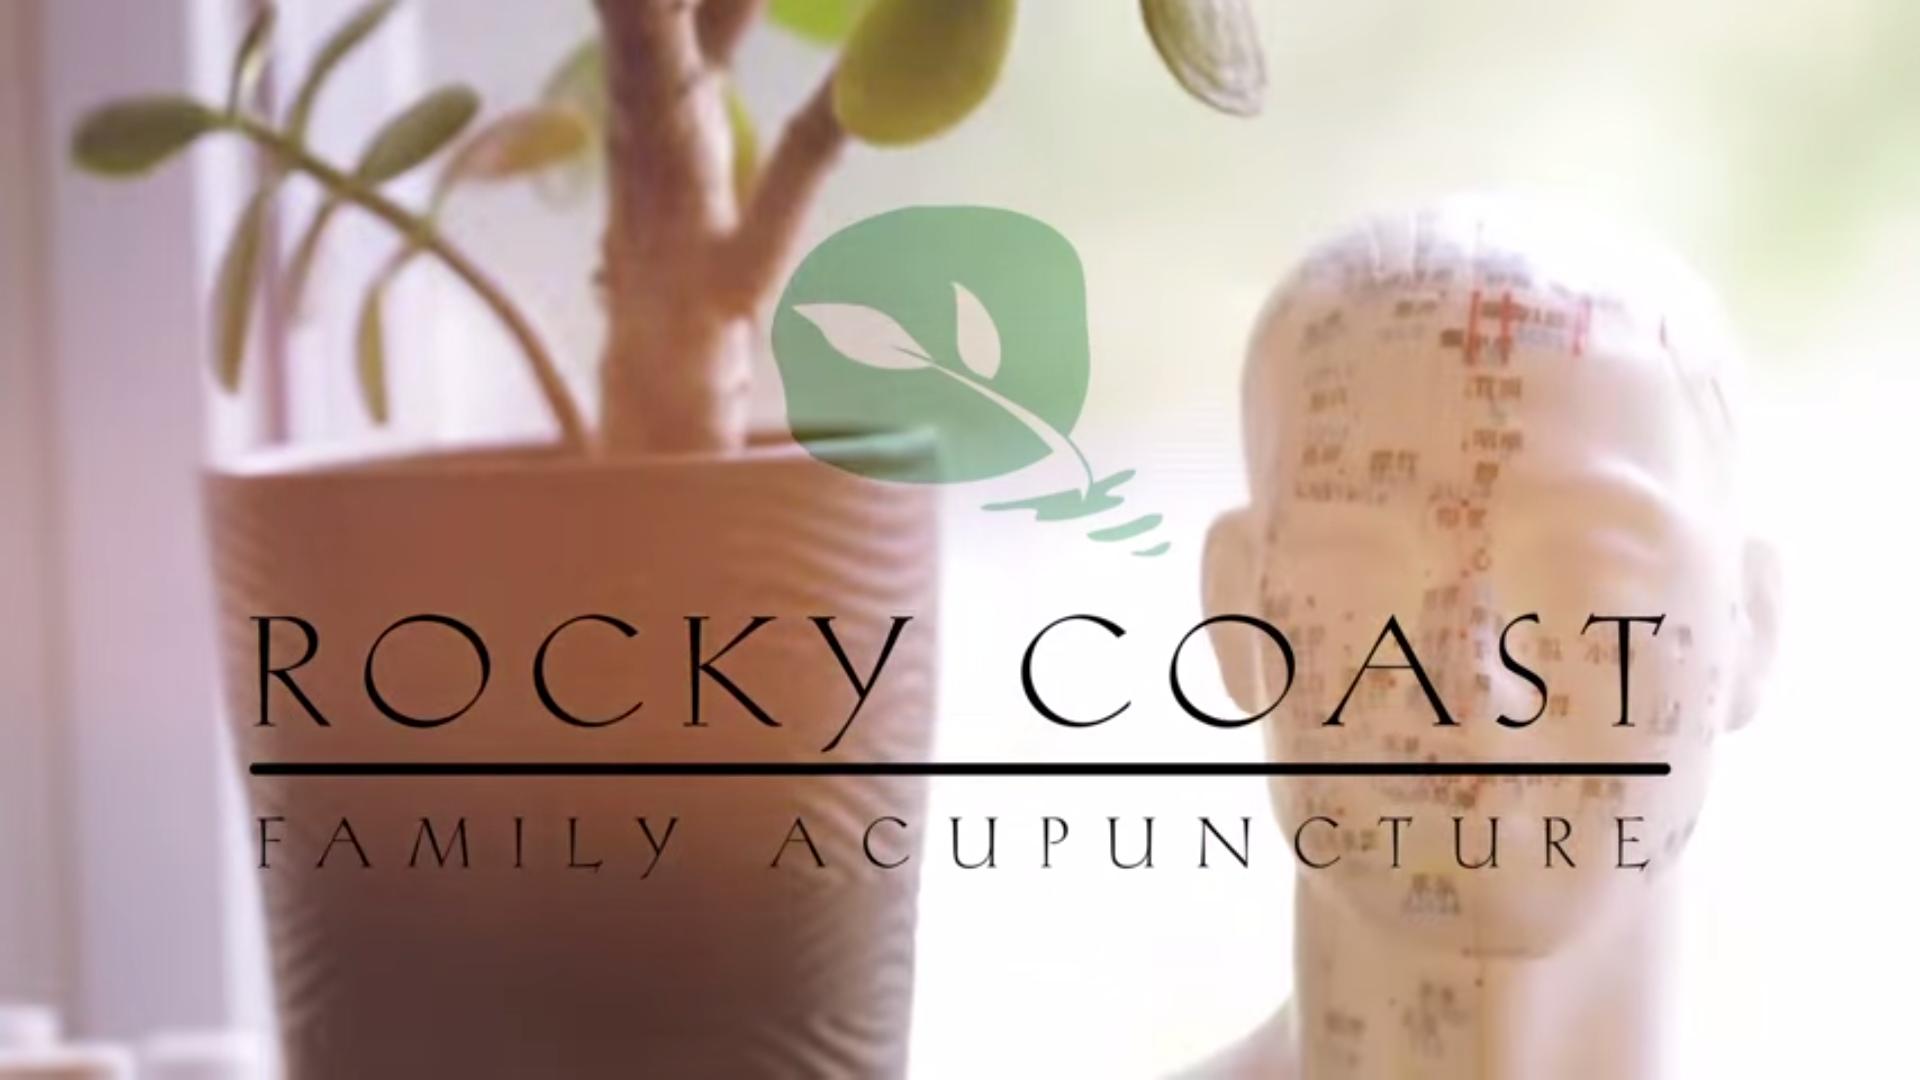 No Umbrella--Rocky Coast Family Acupuncture testimonial video